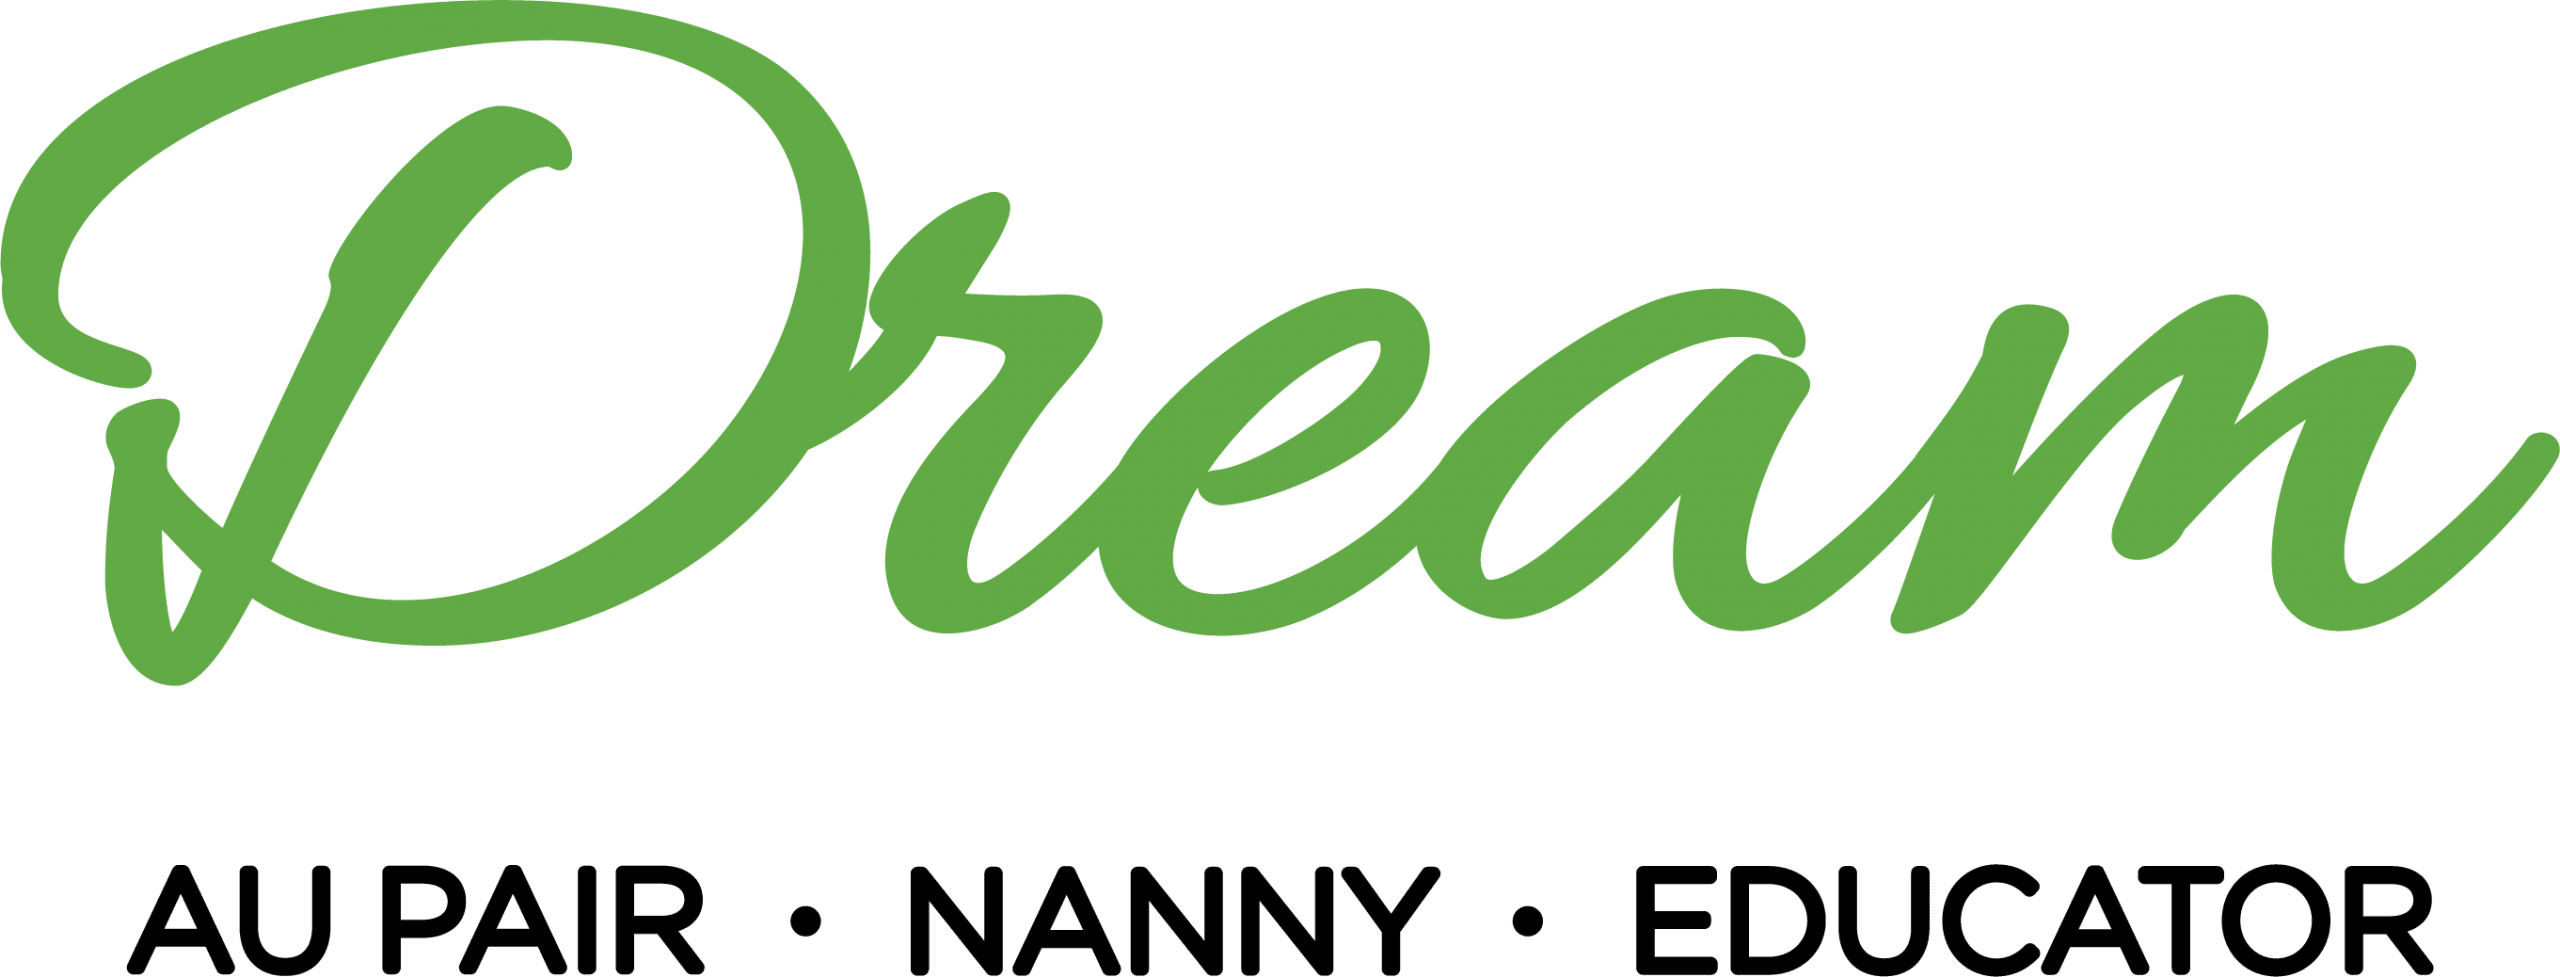 kiwi oz nannies